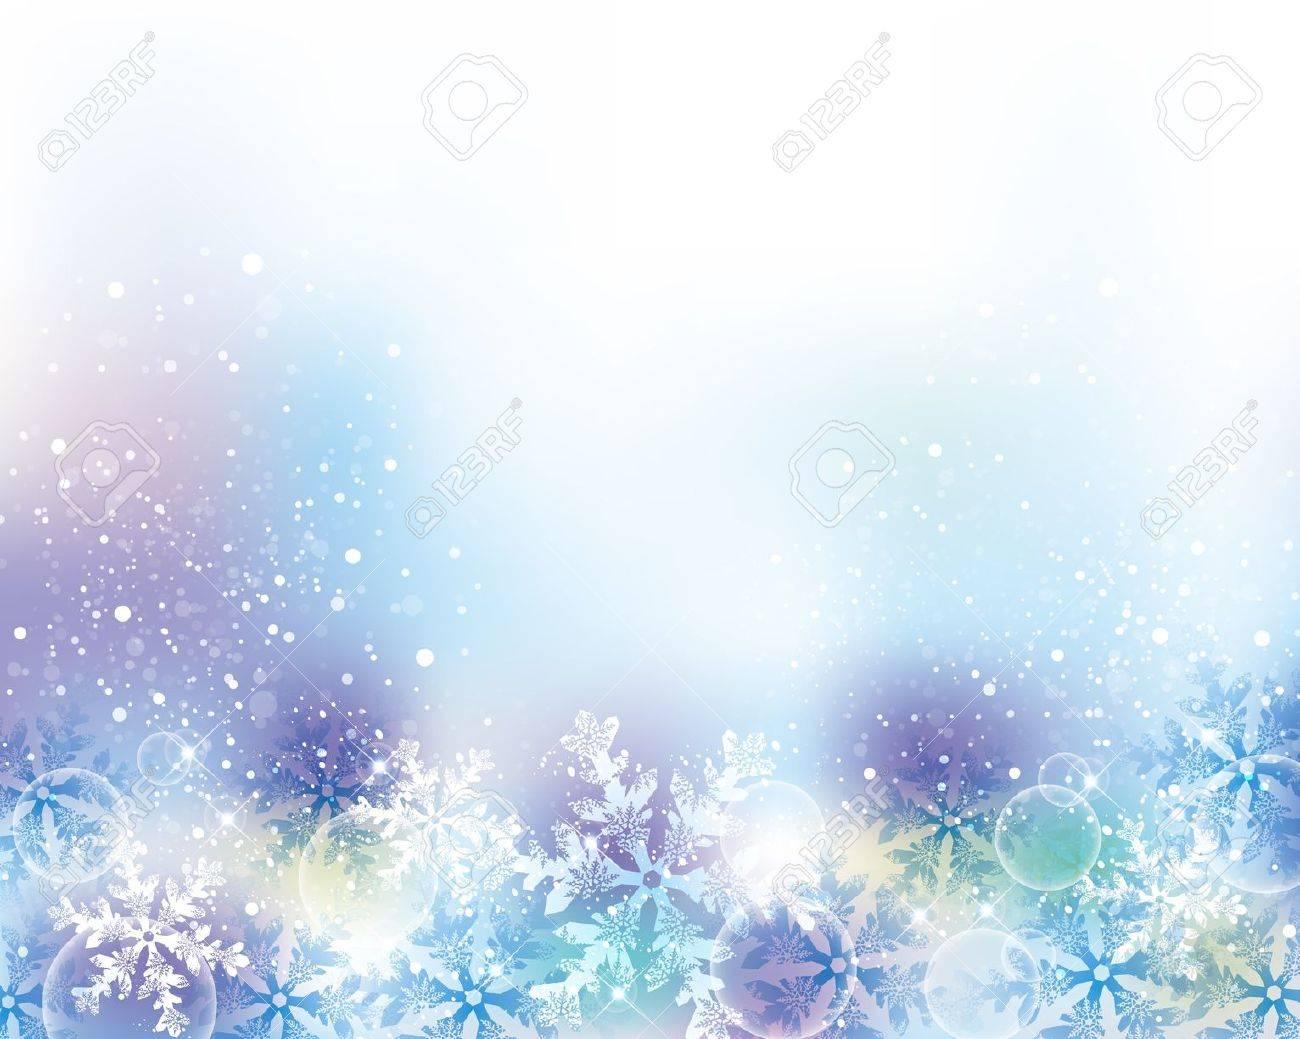 crystal shines background - 15656271